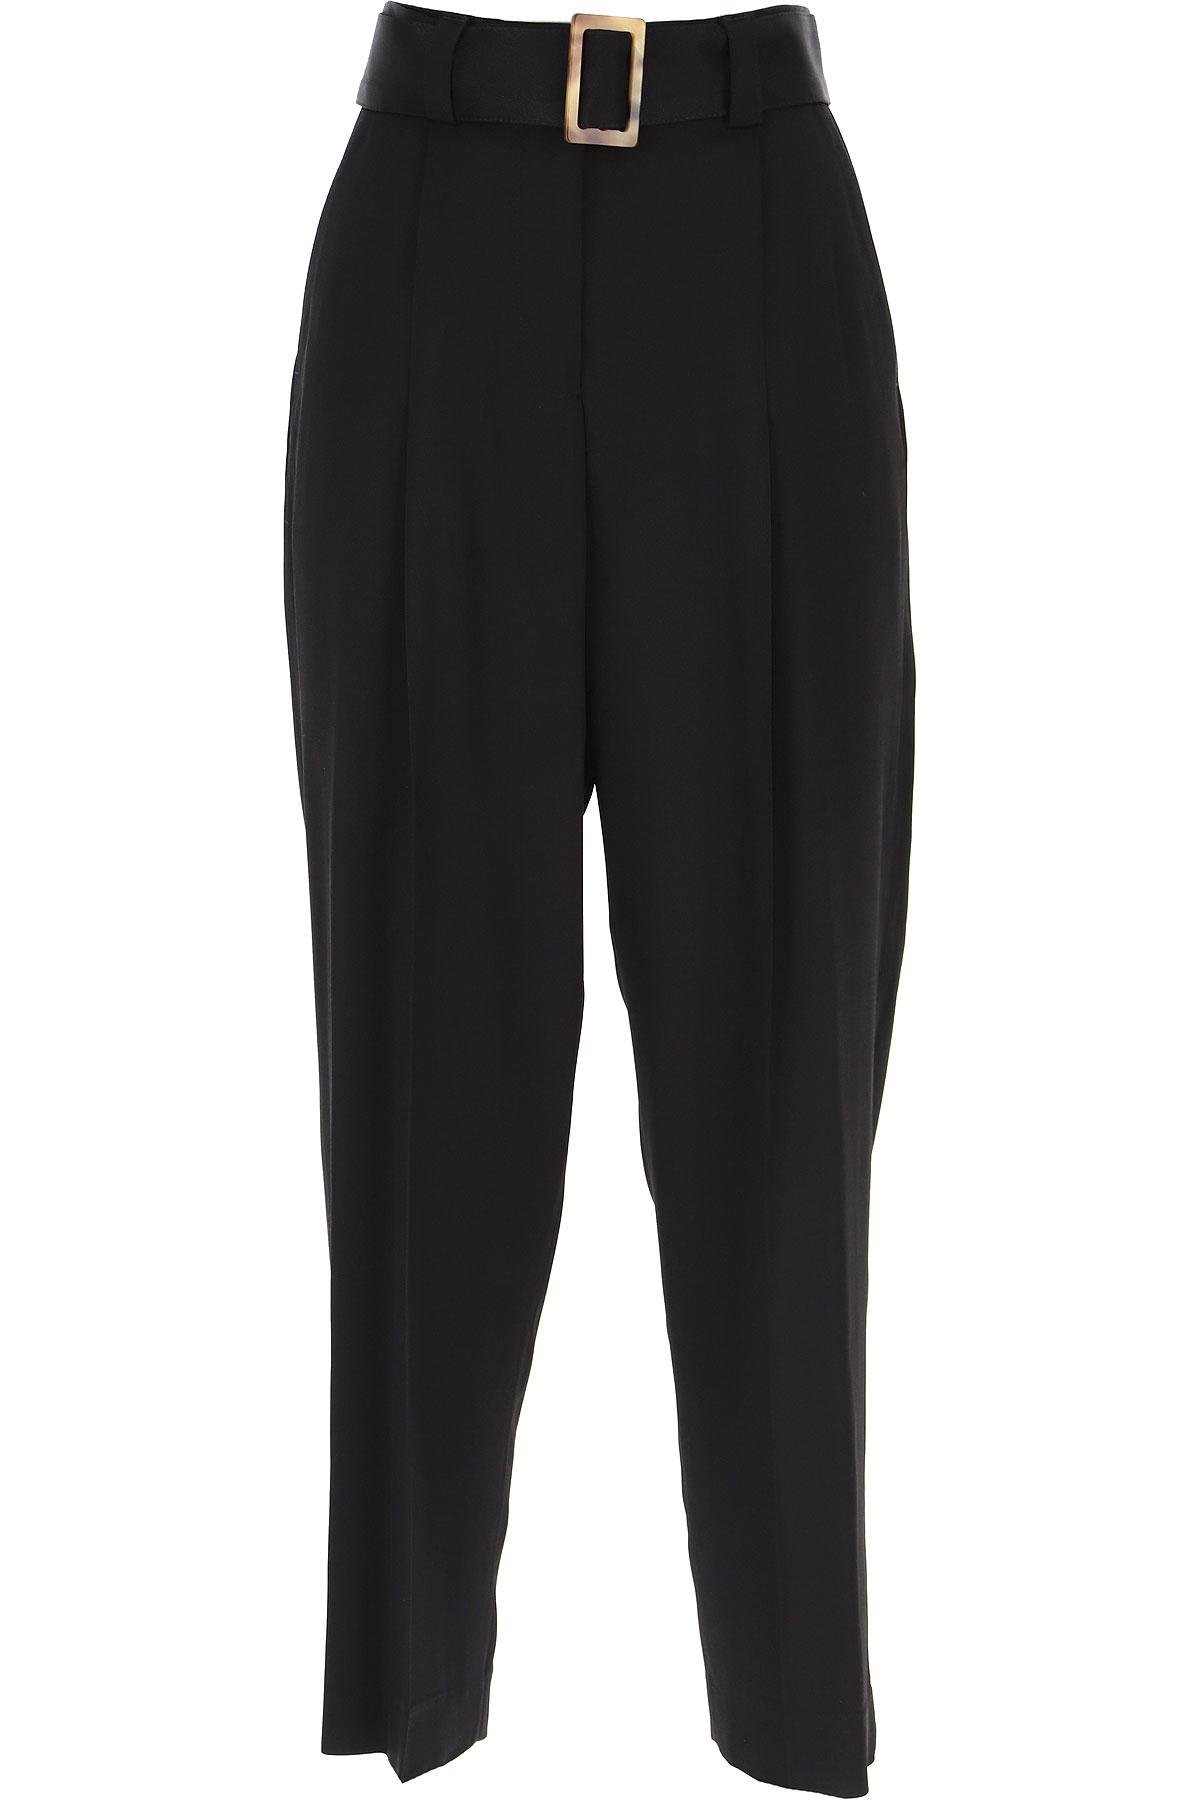 PT01 Pants for Women On Sale, Black, Viscose, 2019, 26 28 30 32